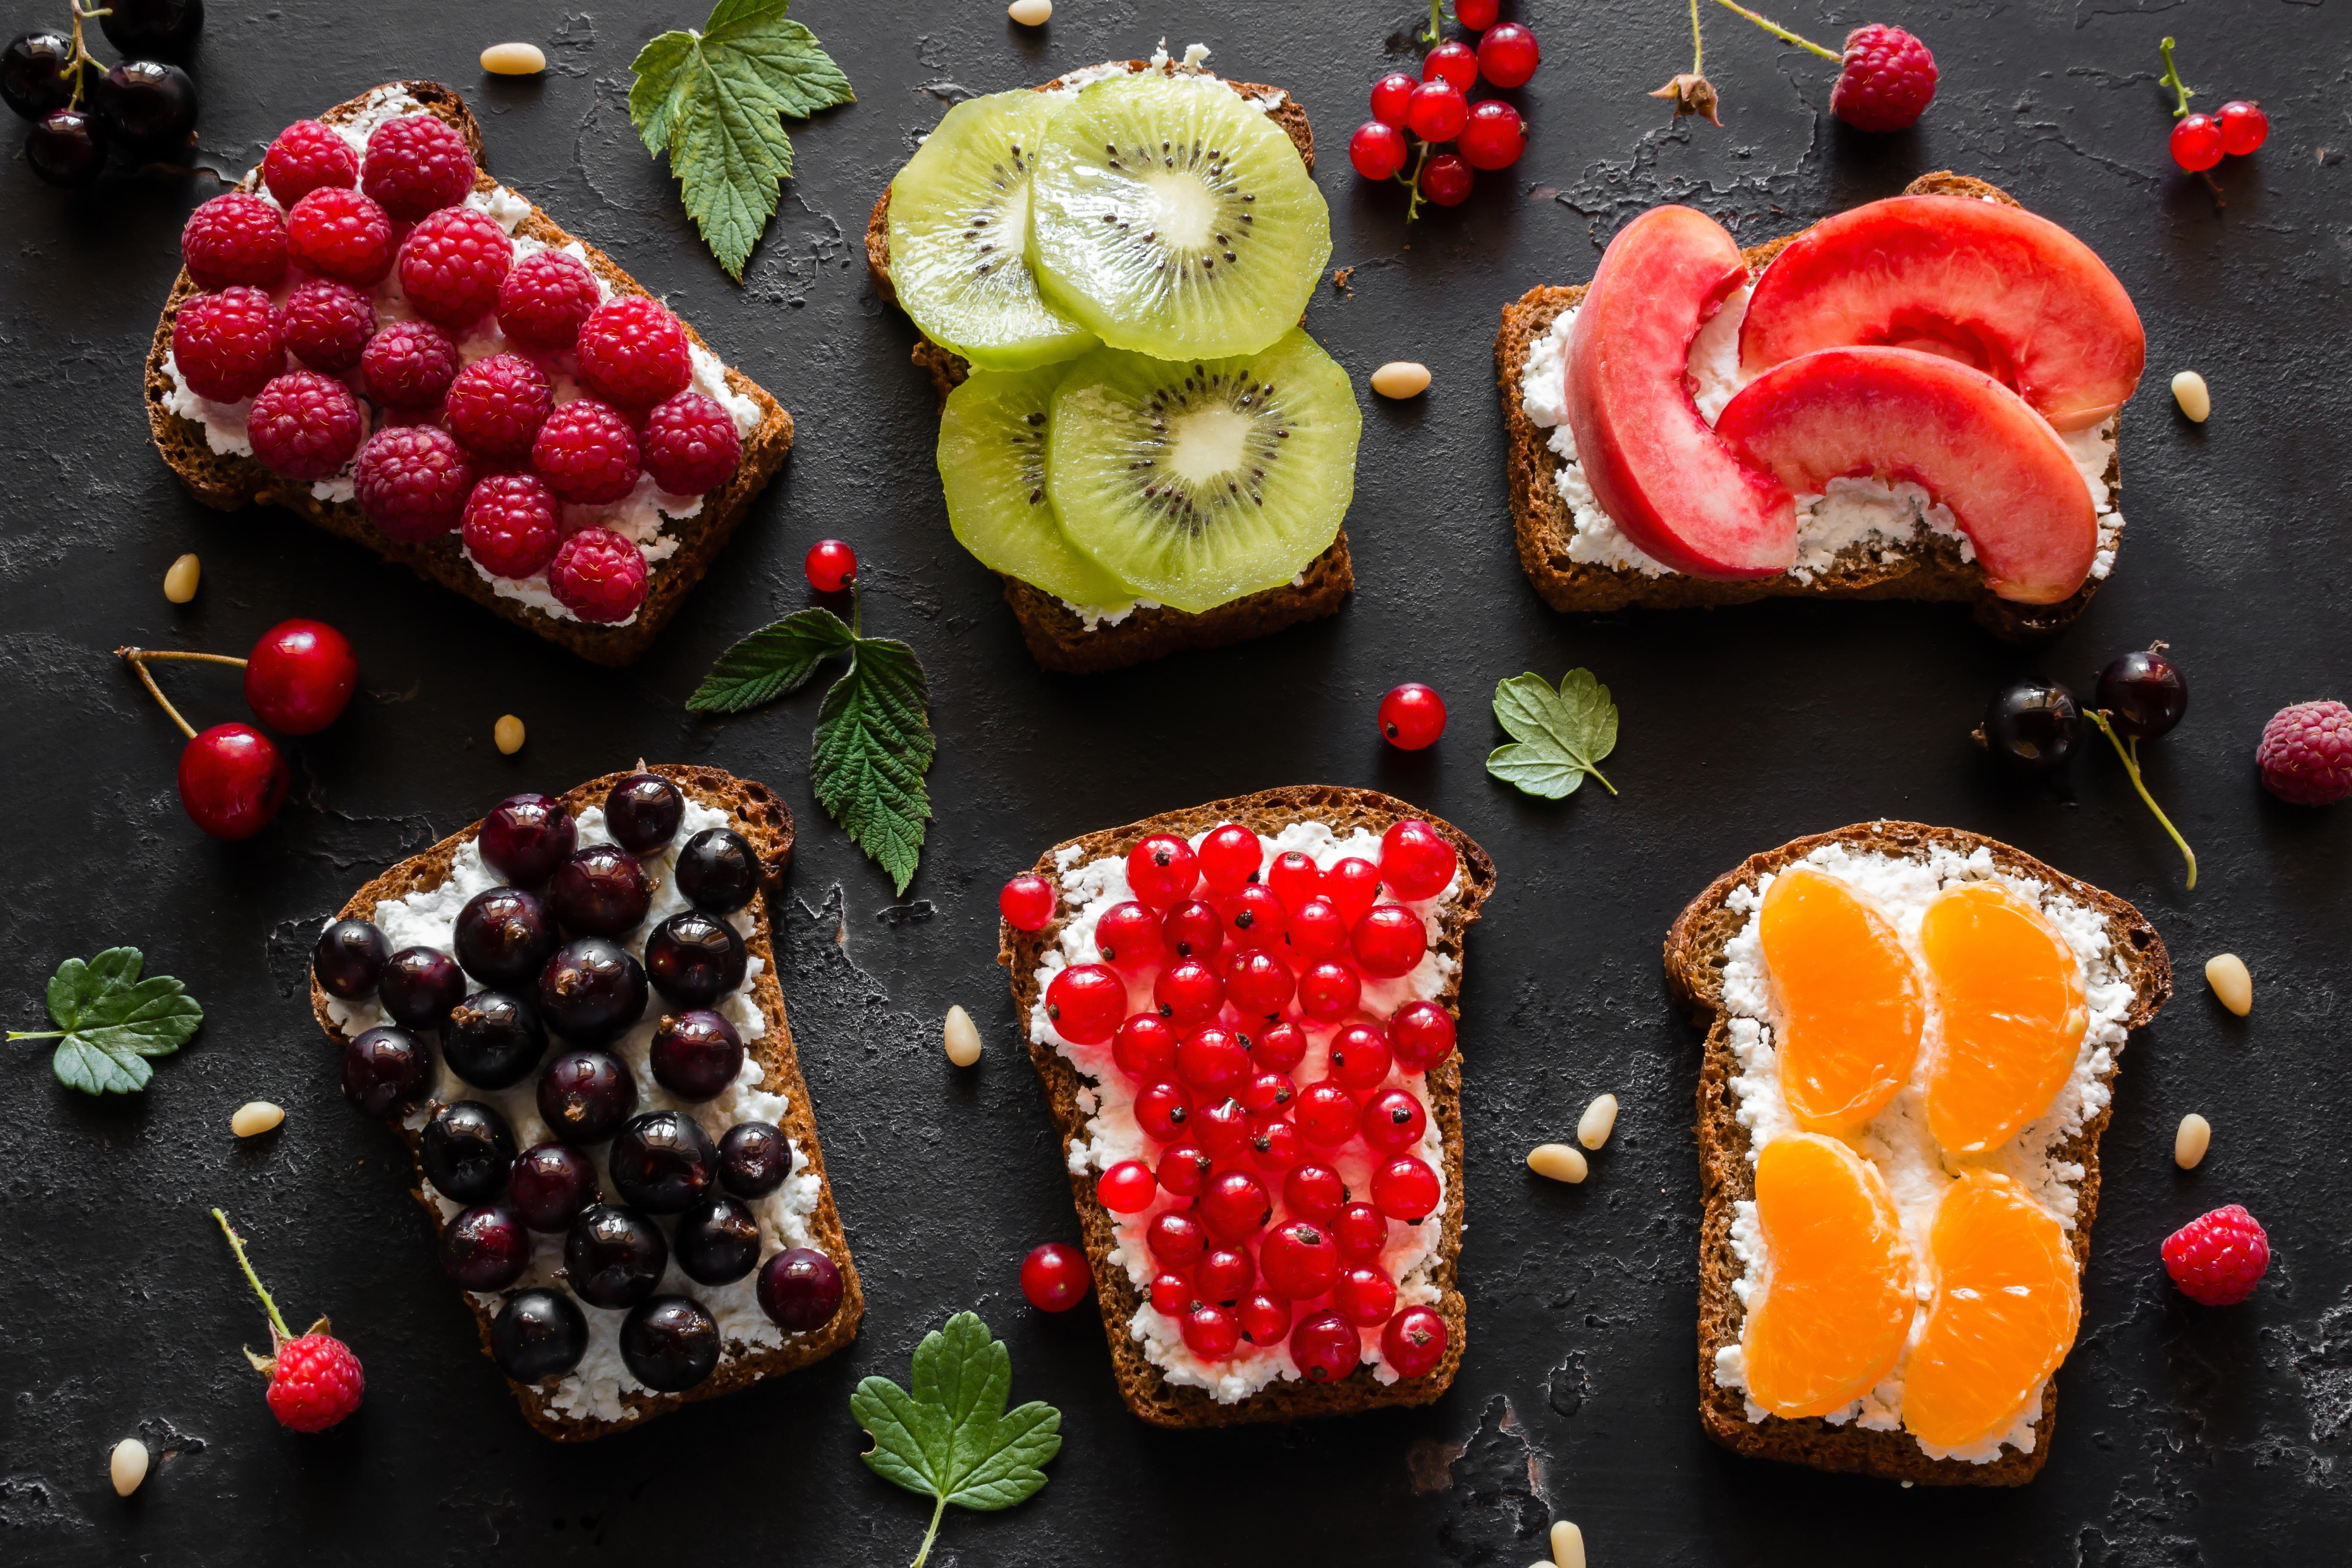 Berry Bread Fruit Still Life Toast 5472x3648